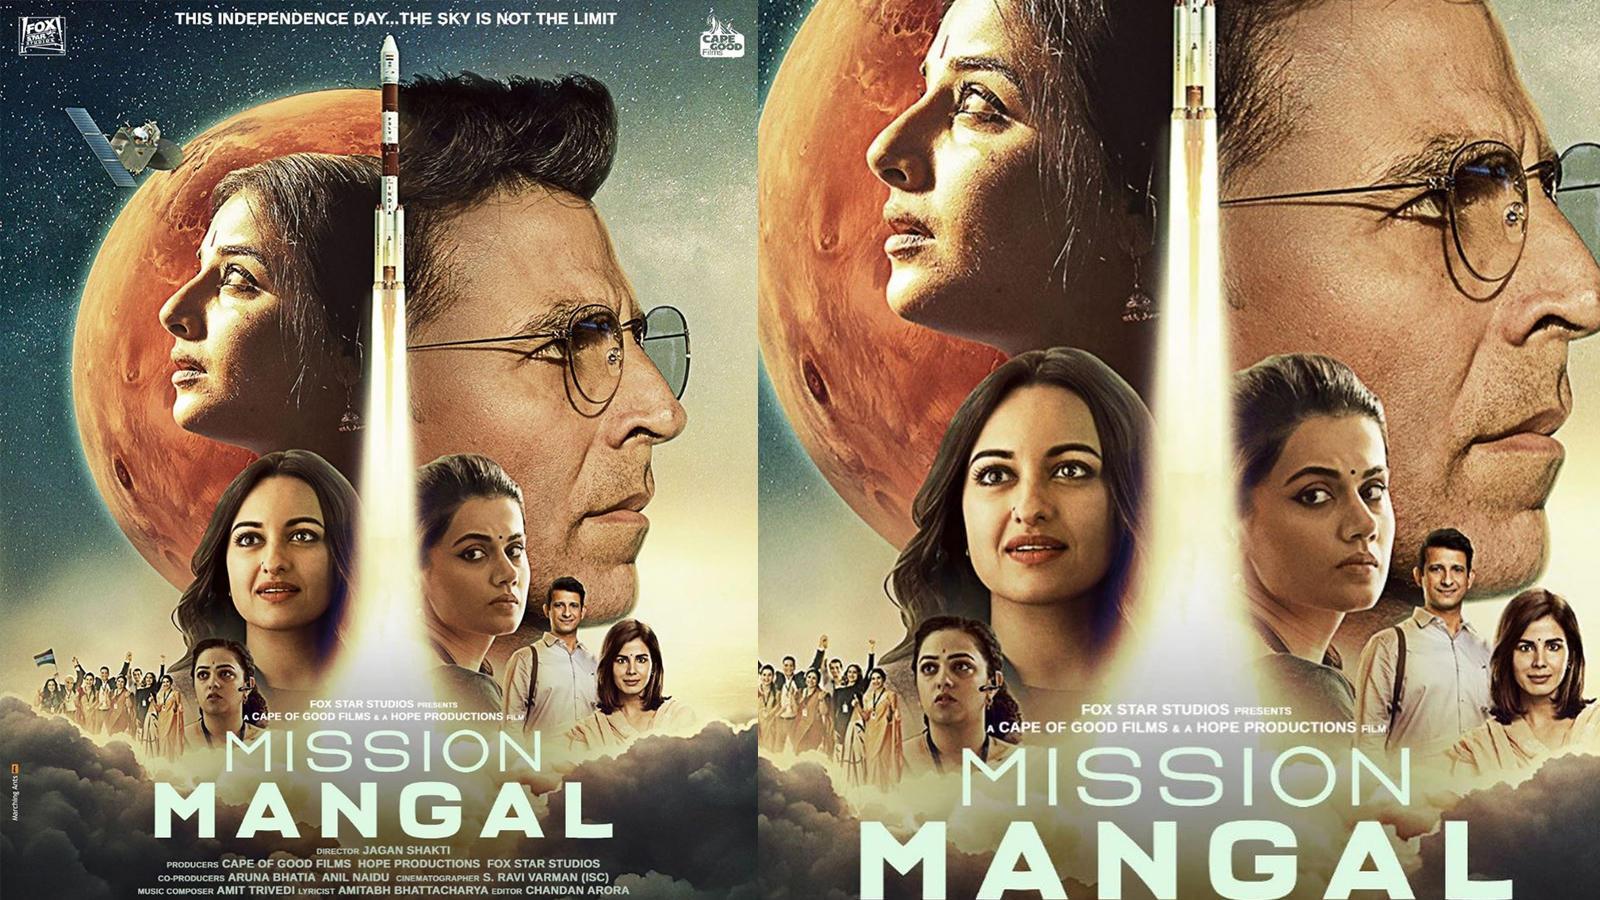 Akshay Kumar shares new poster of 'Mission Mangal'